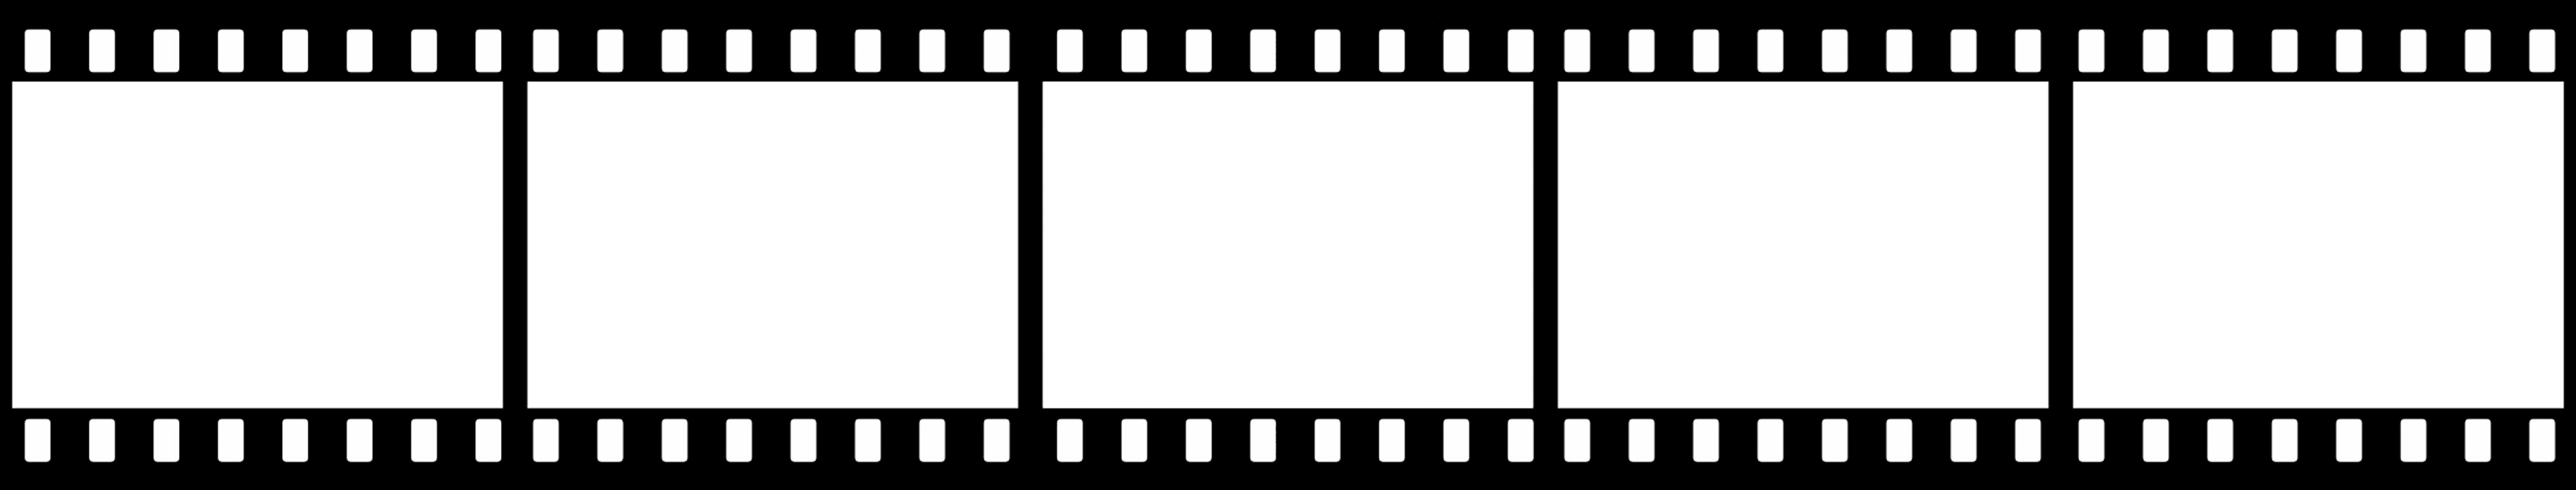 Film Reel PNG - 64804